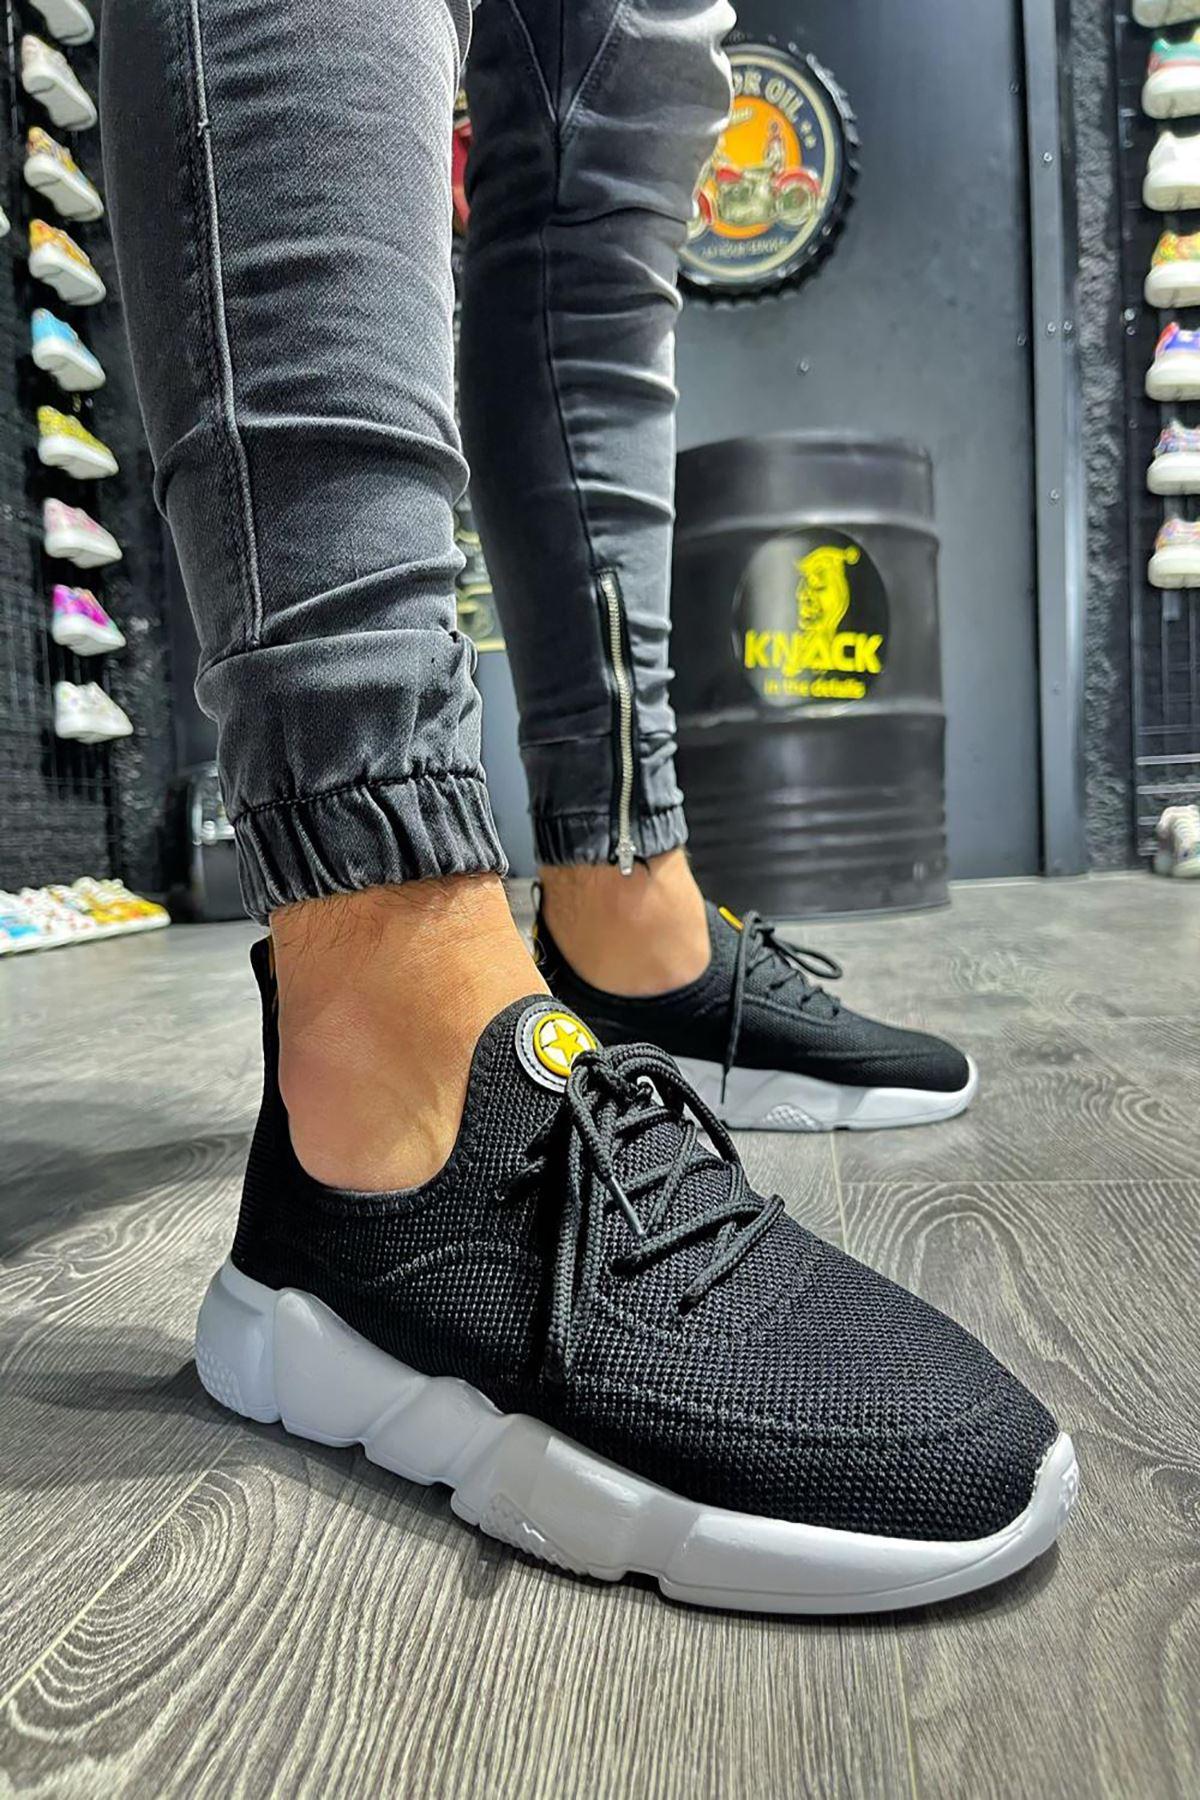 KX-300 Siyah BT Keten Spor Sneakers